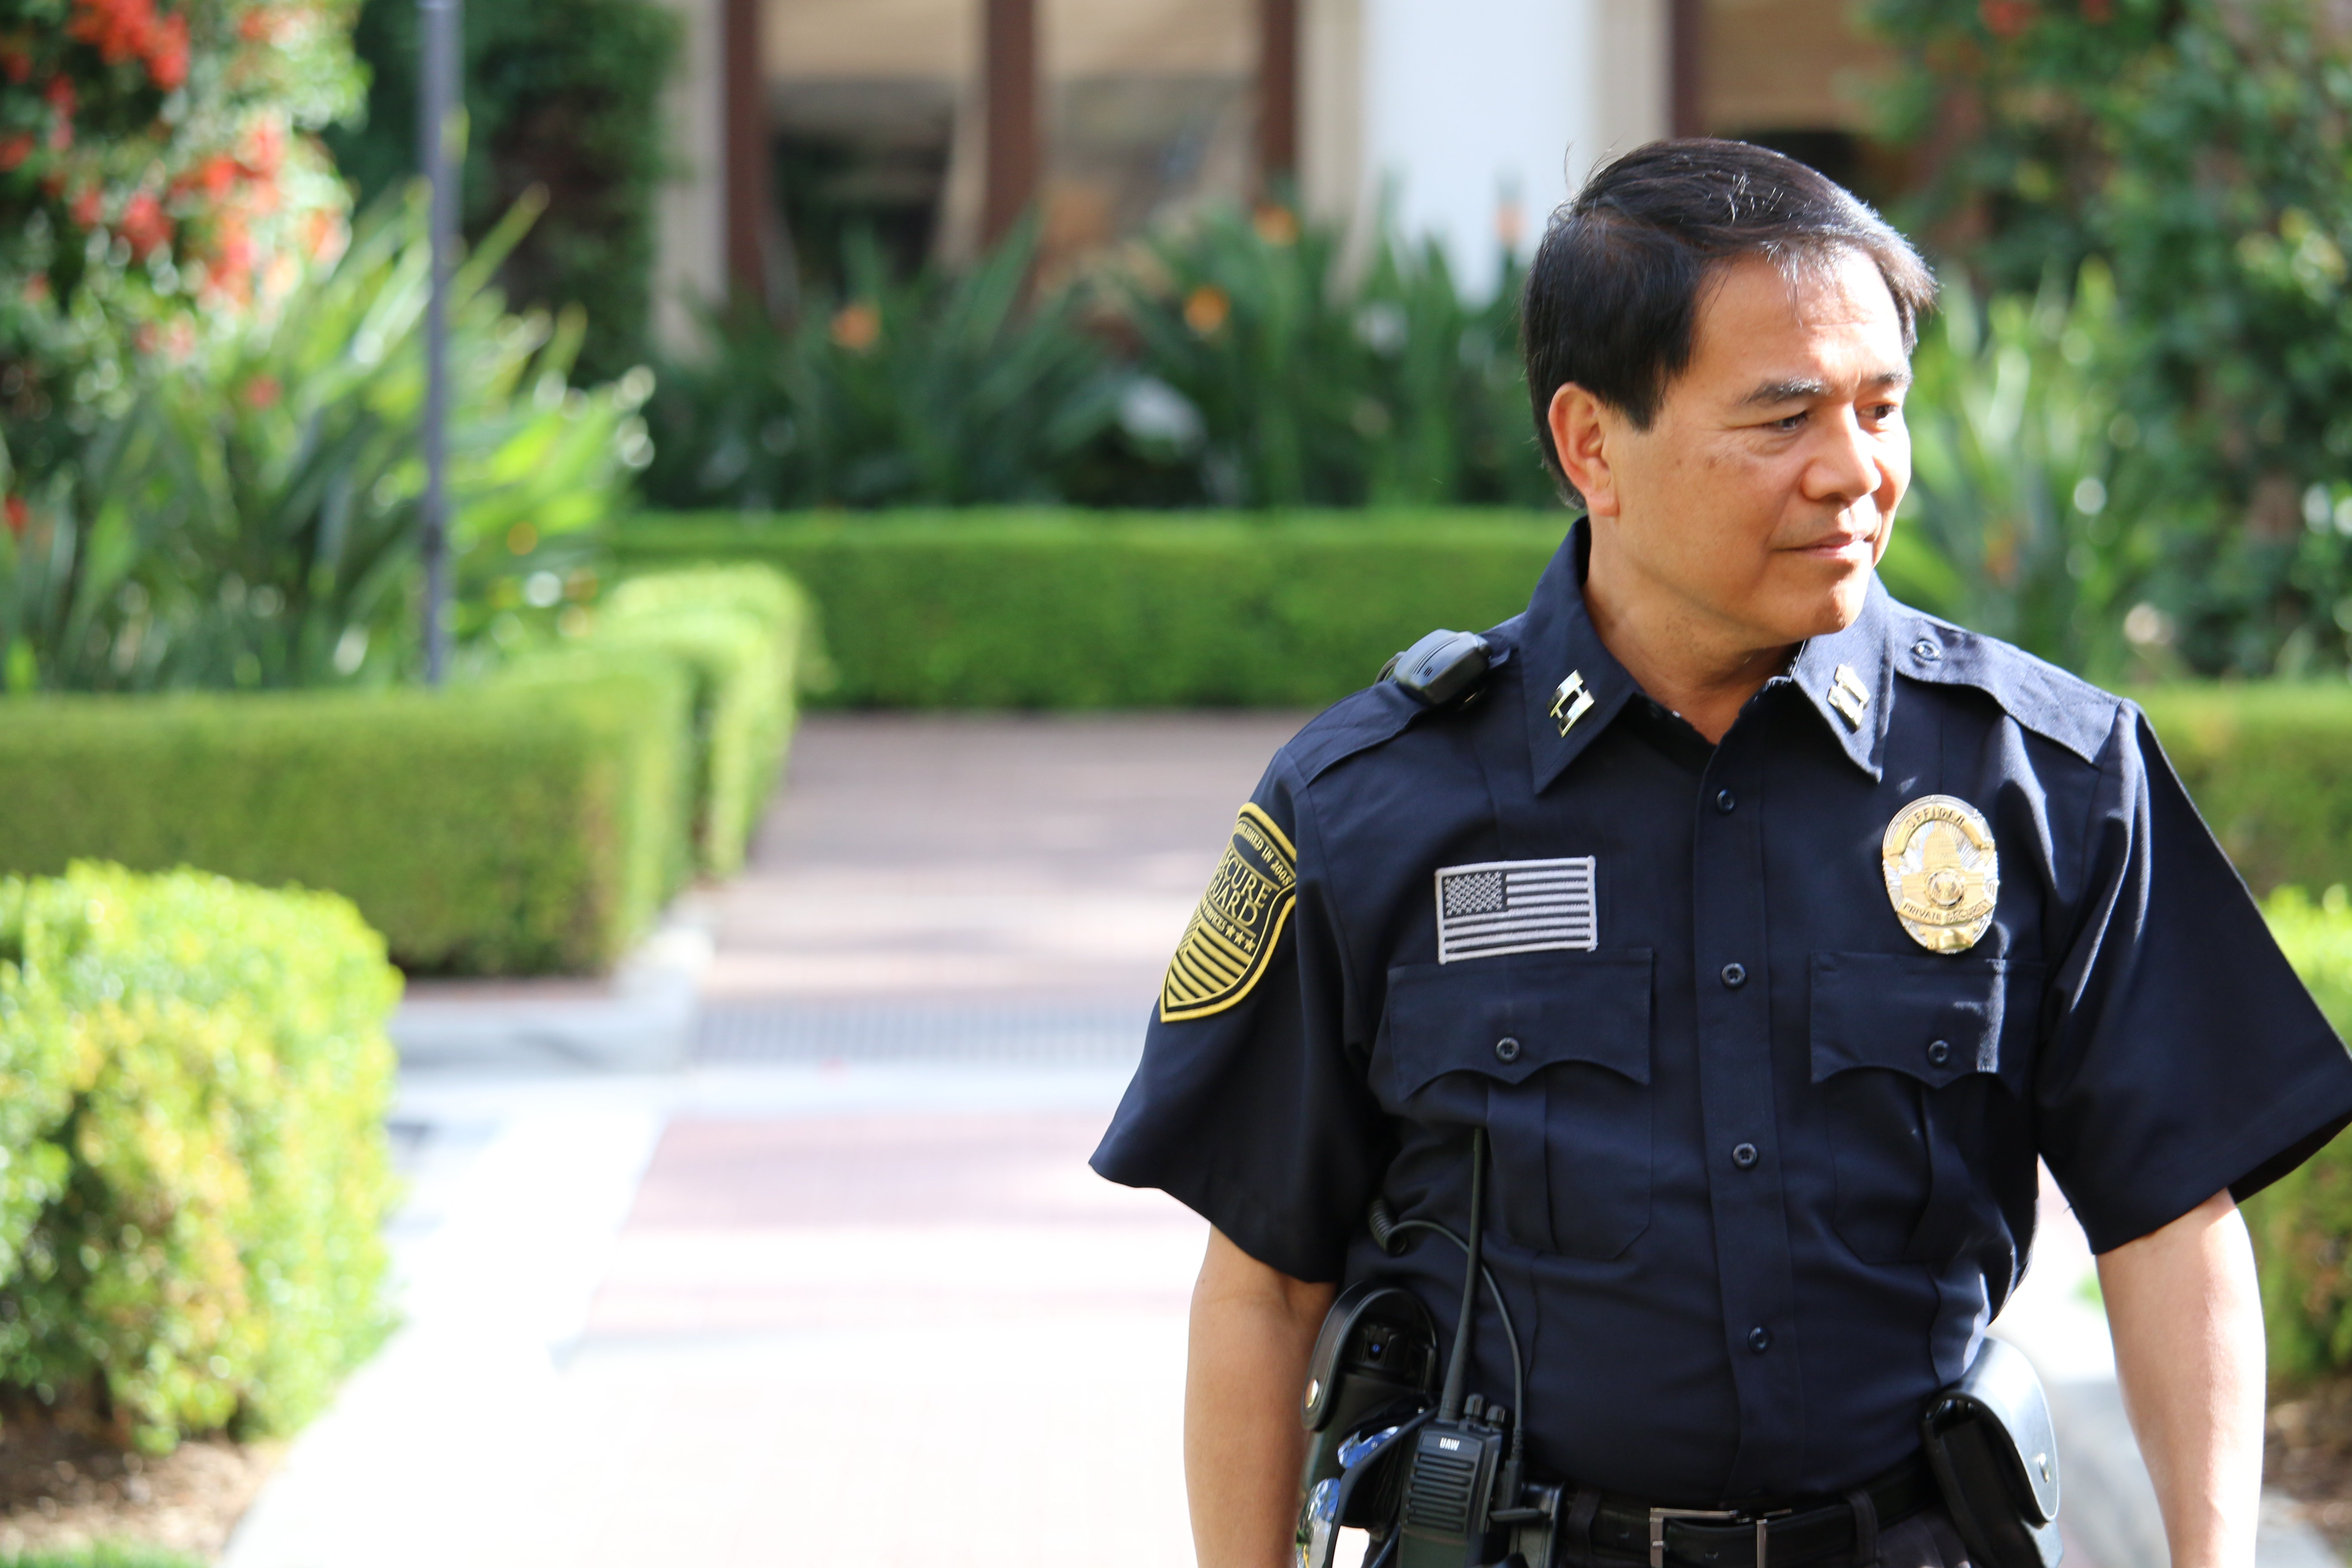 Orange County Security Services